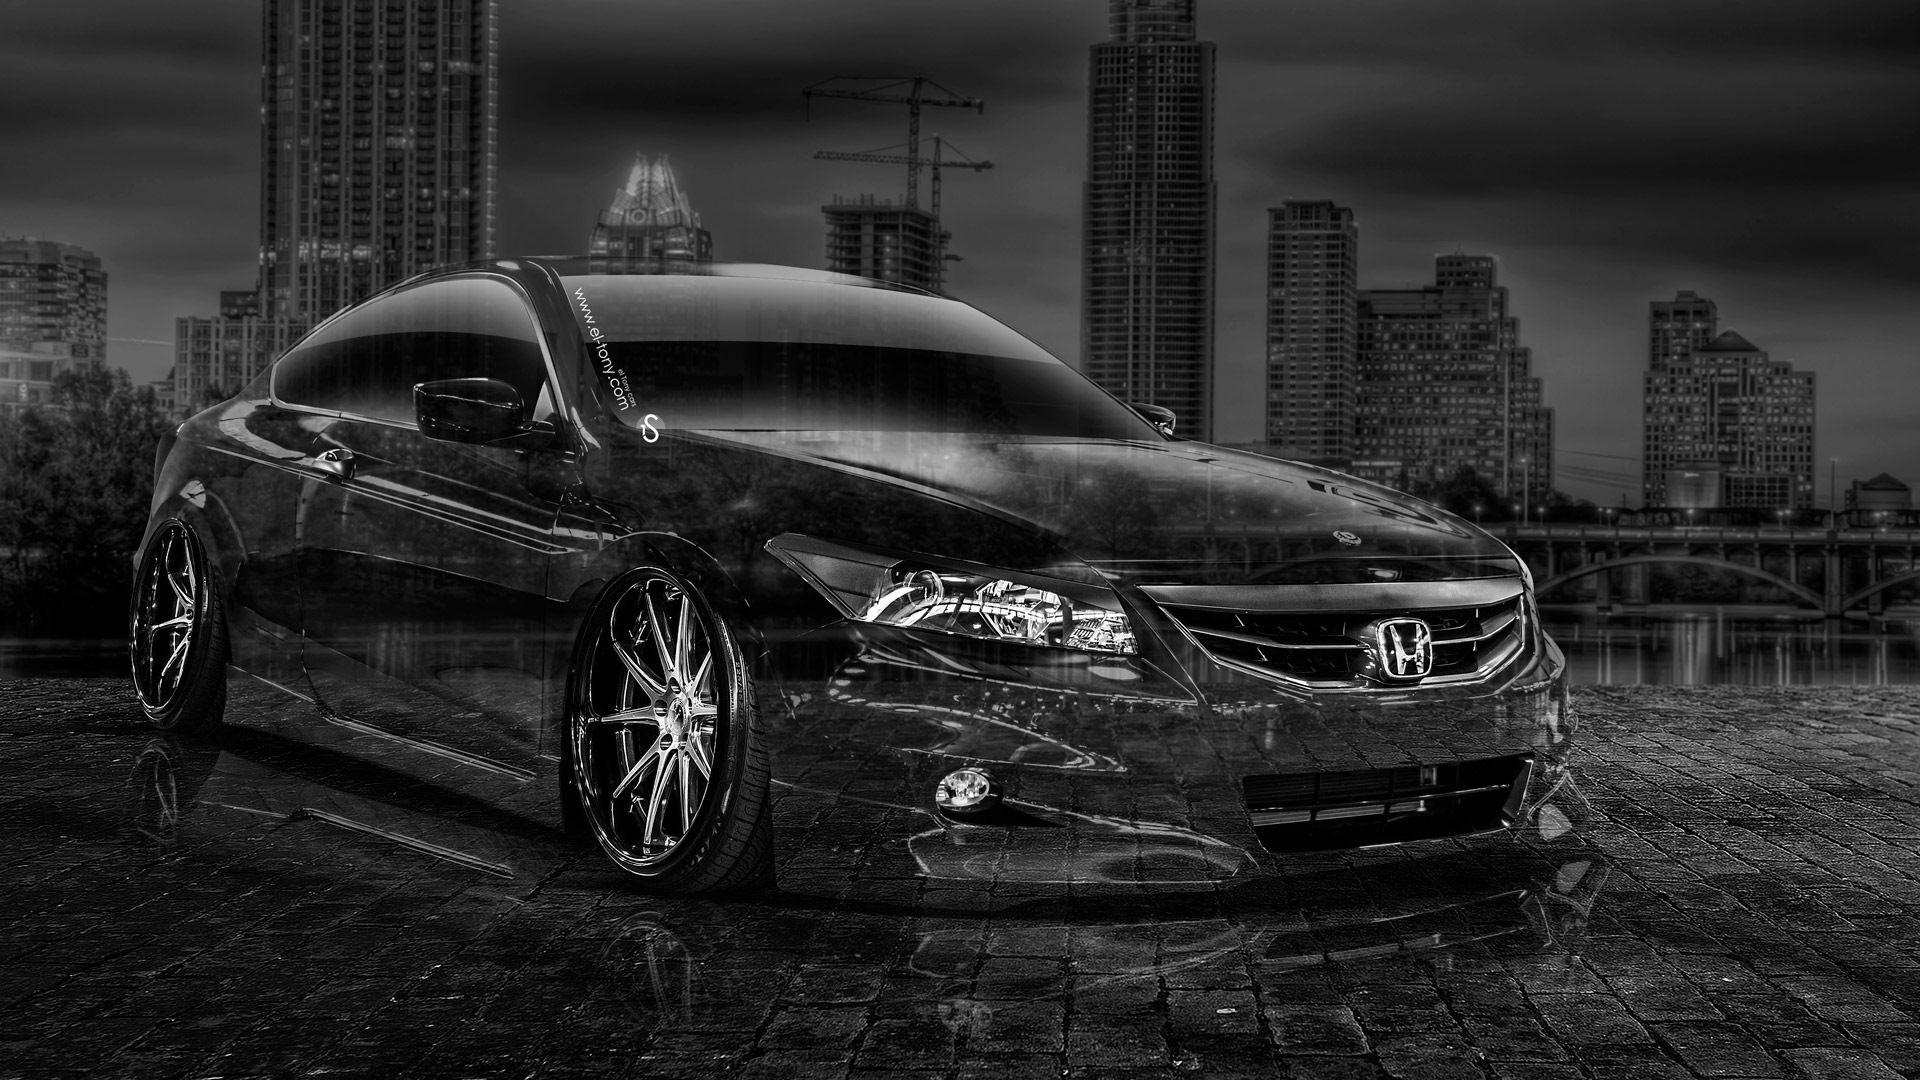 Honda Accord wallpaper free